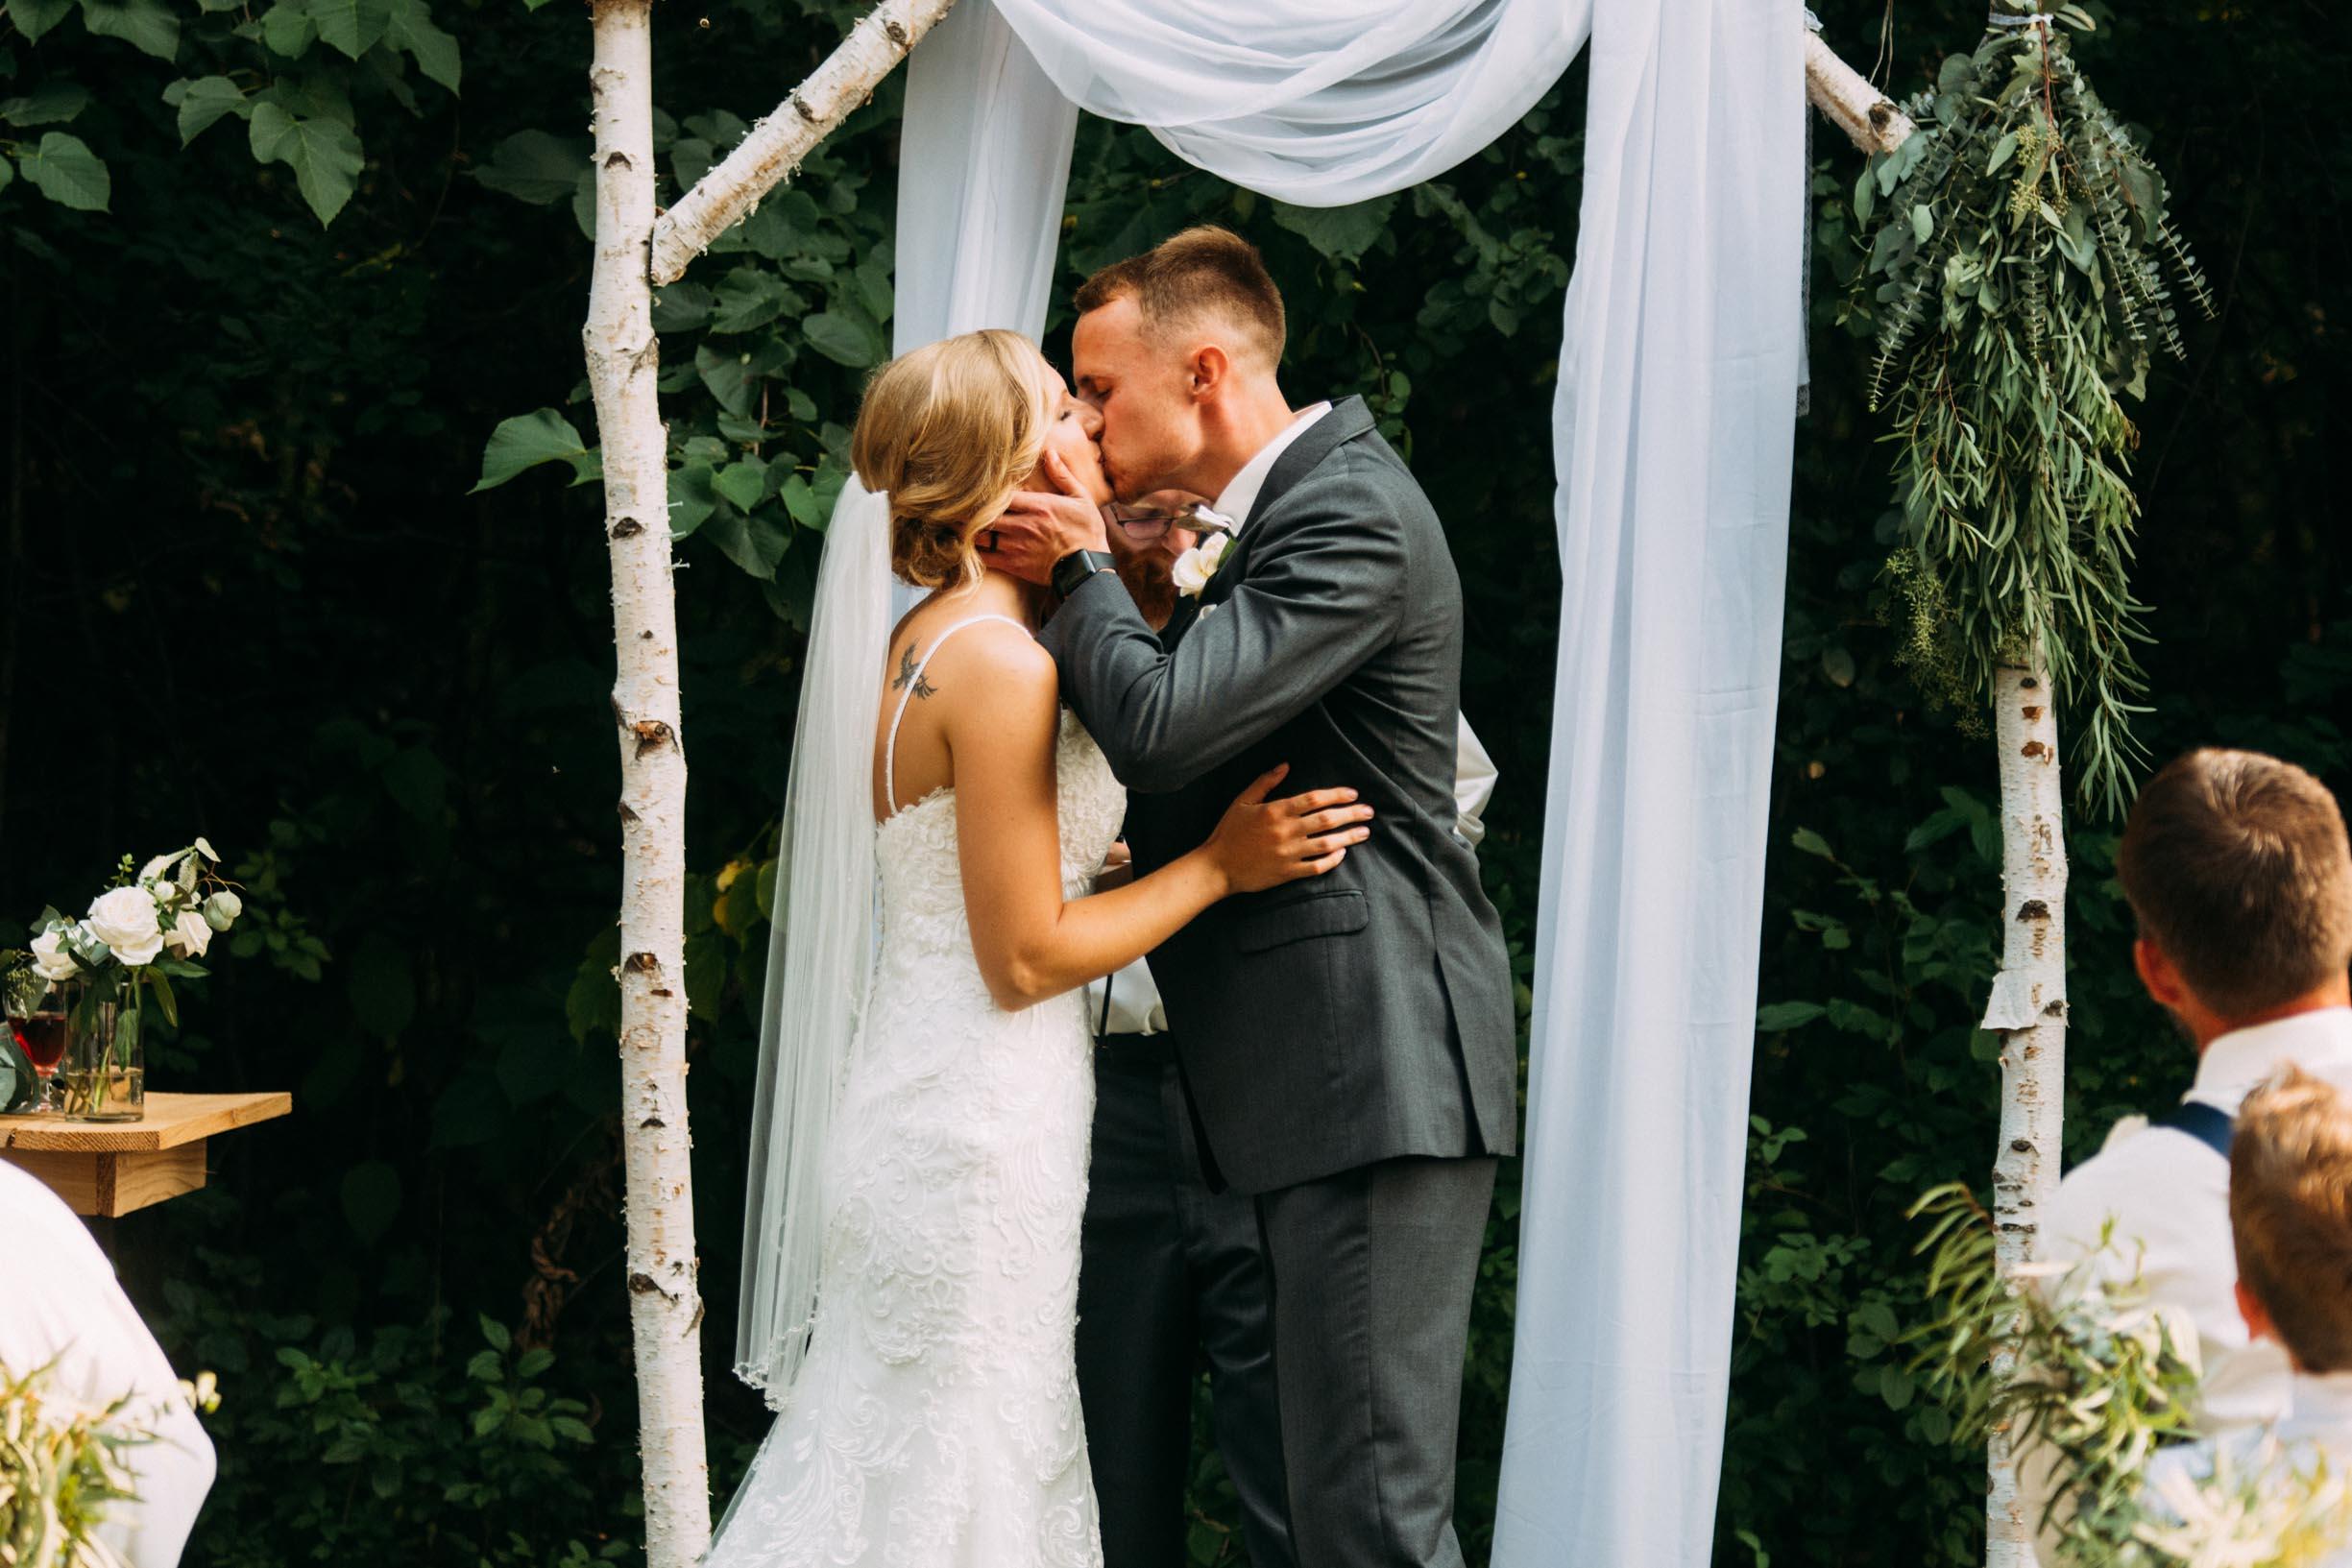 24-Minnetonka Orchards Wedding Ashley Bryce Blog.jpg